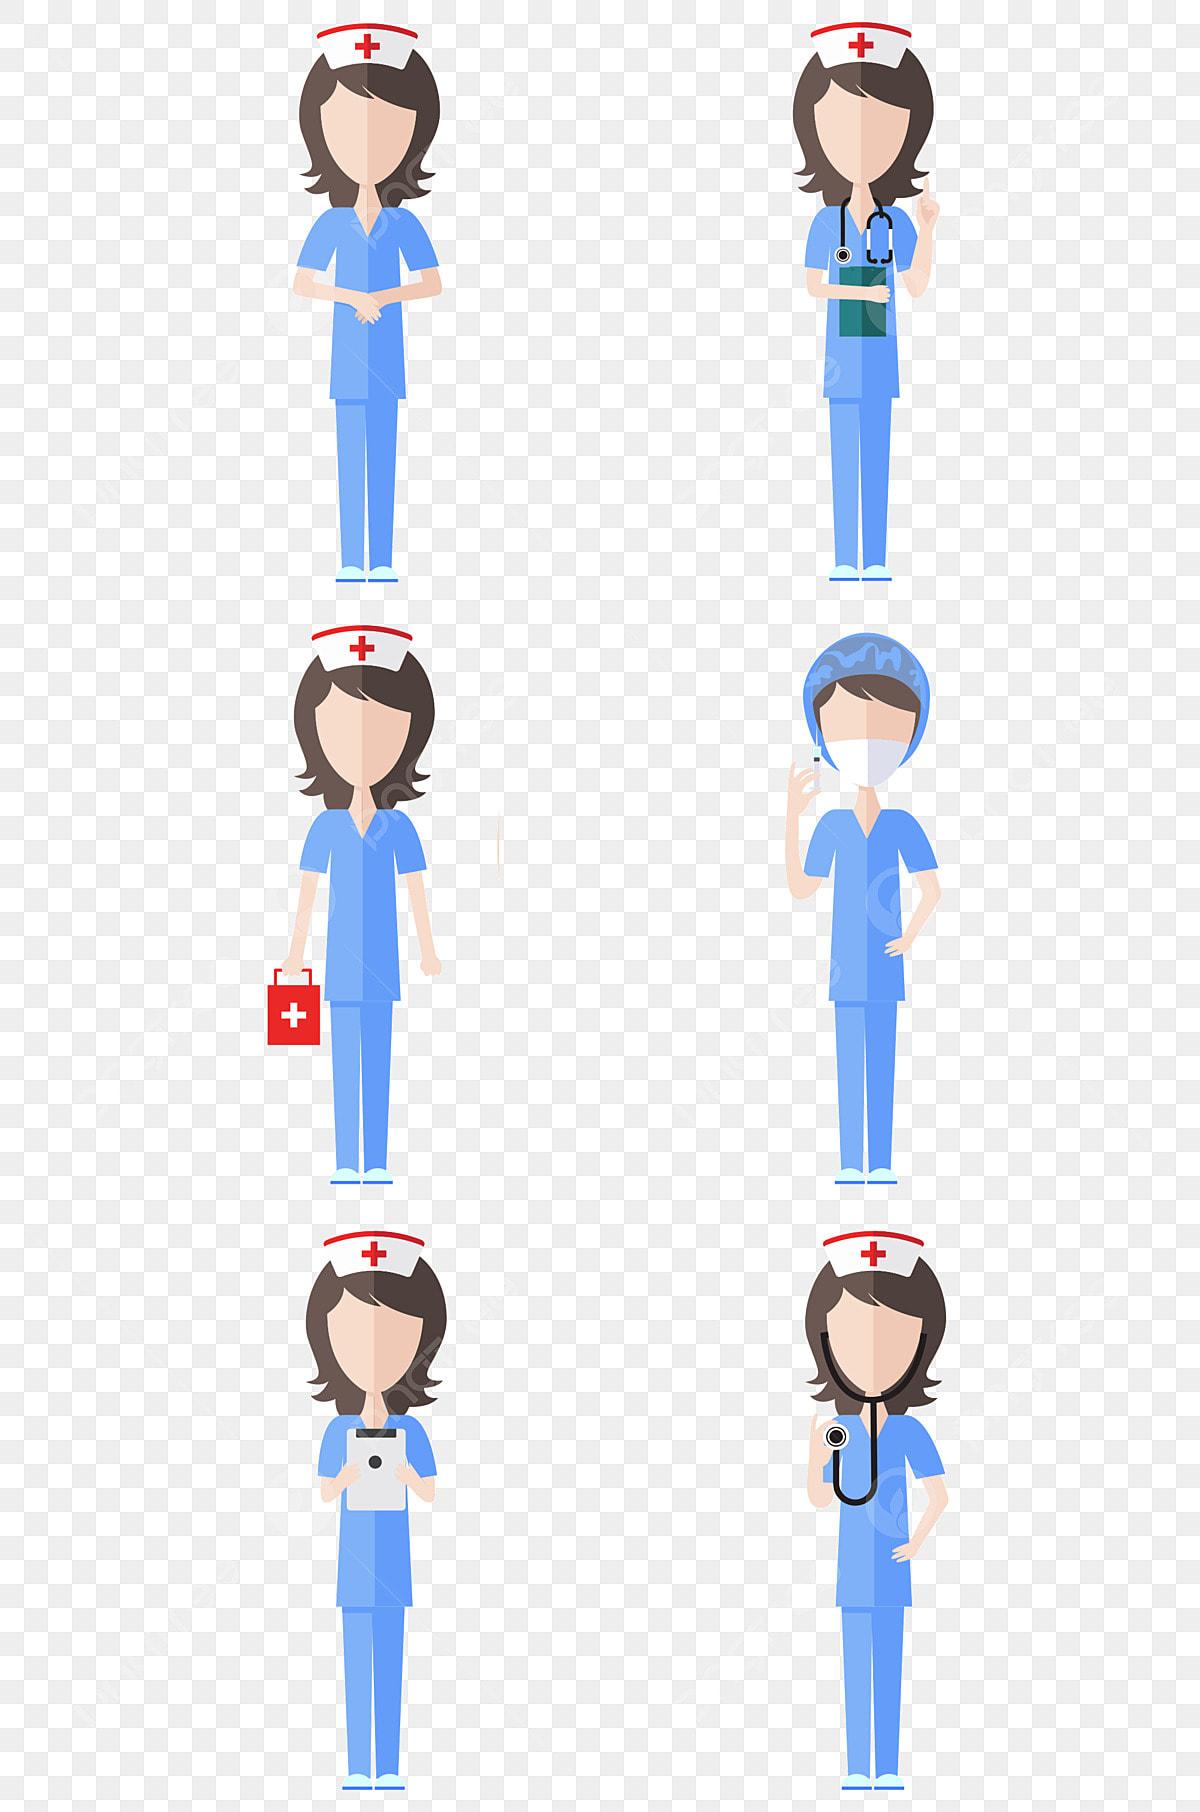 Cartoon Nurse Border Illustration, Cartoon Nurse, Red, Border PNG  Transparent Clipart Image and PSD File for Free Download